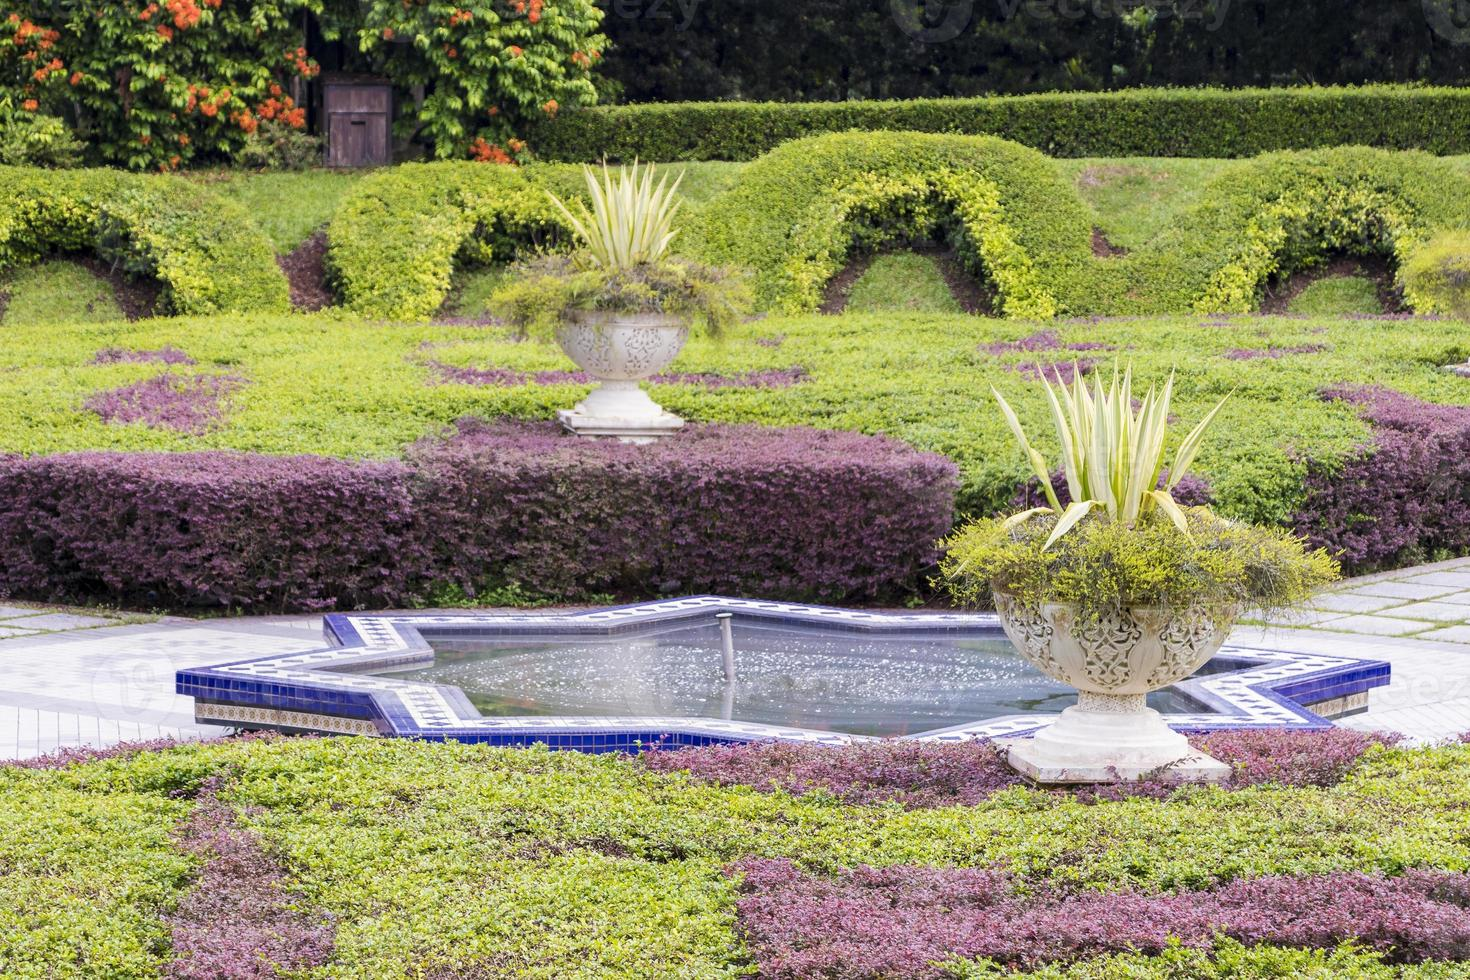 beaux jardins botaniques de perdana engloutis kuala lumpur en malaisie. photo